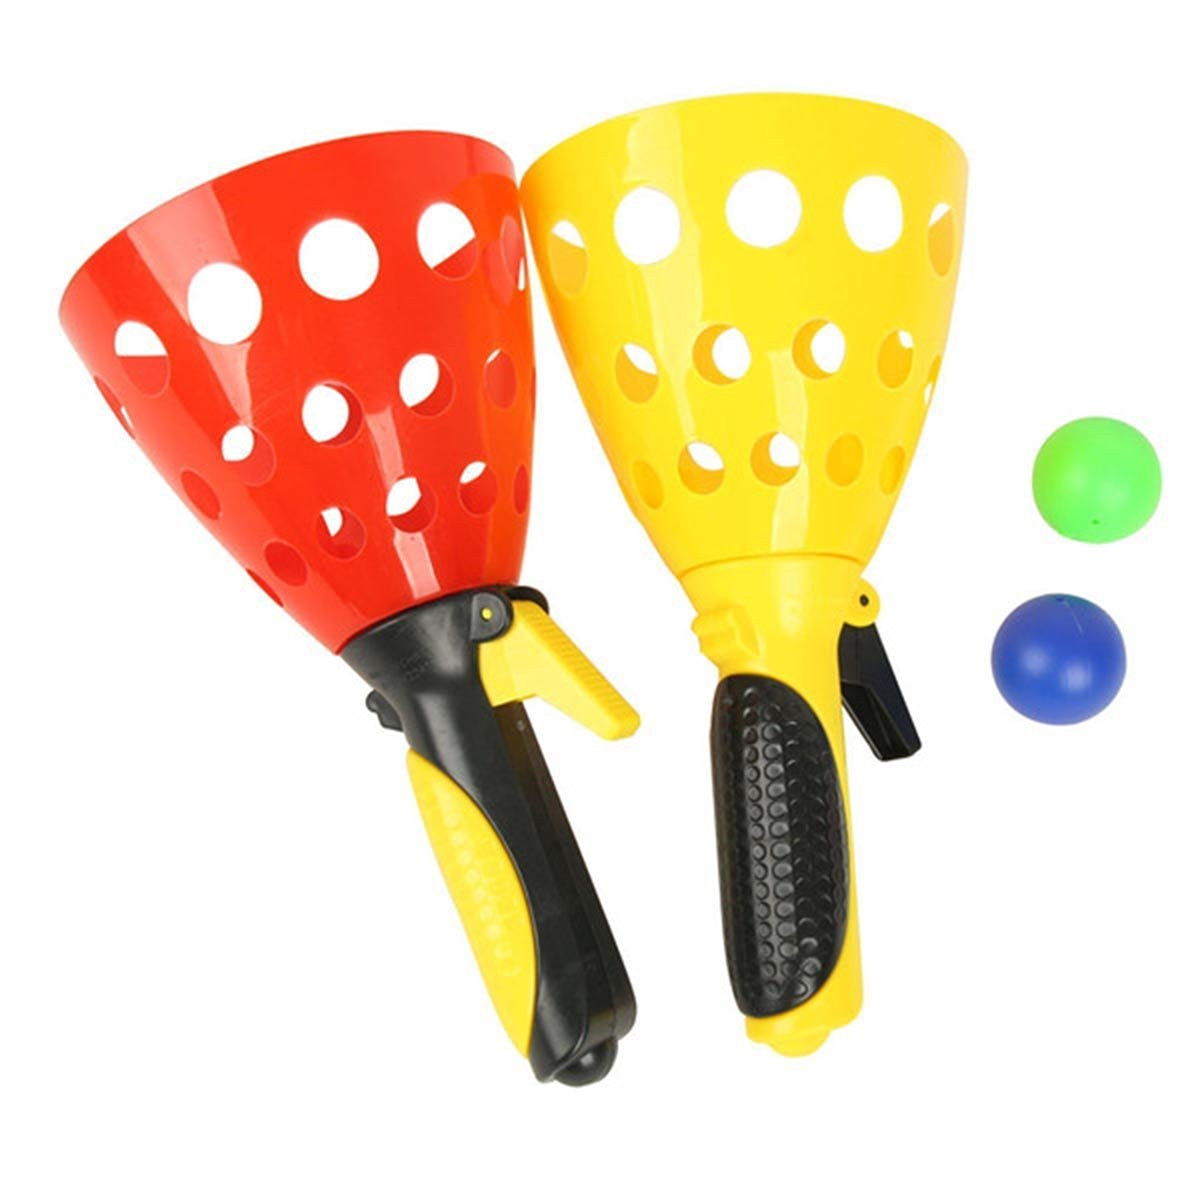 MACH Catching ball game set ball games toy set